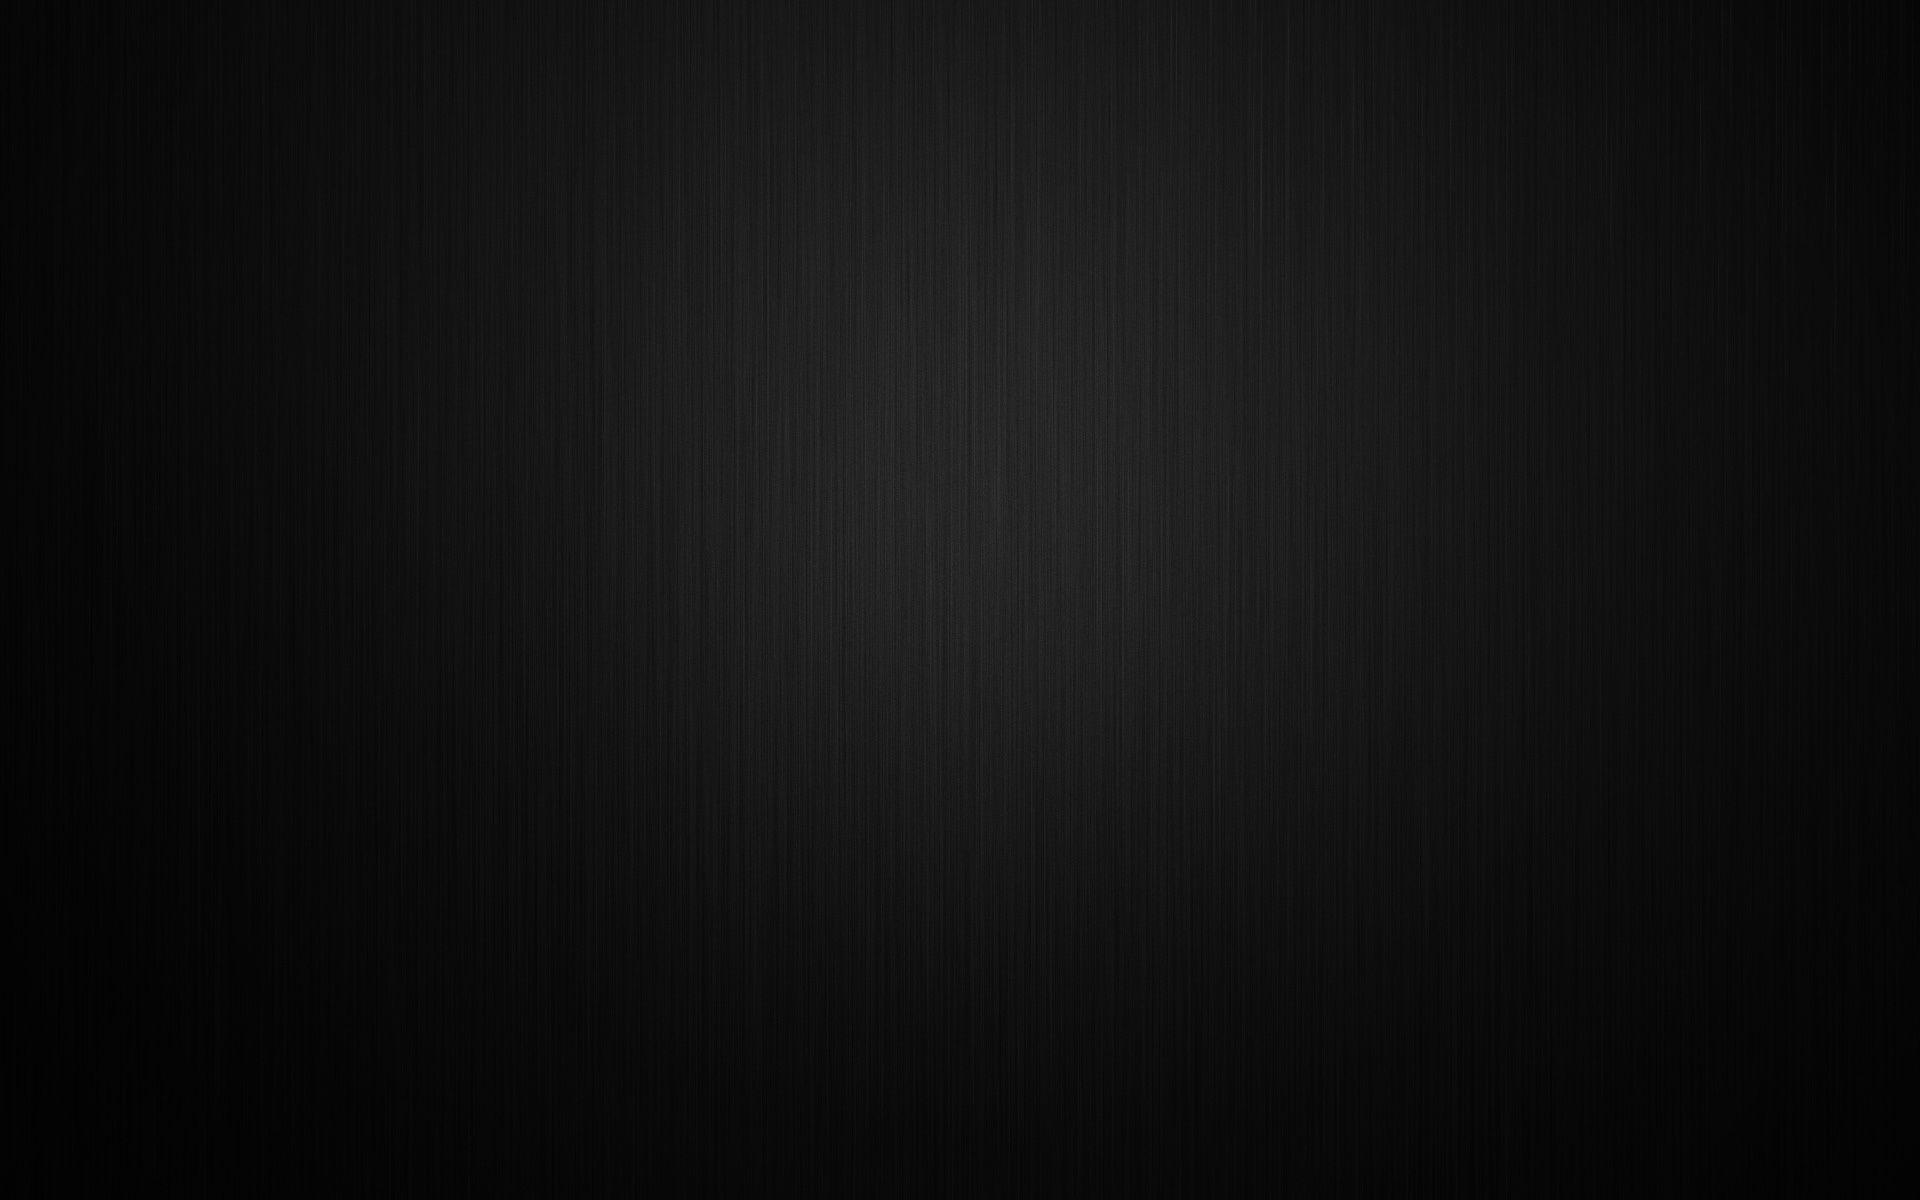 Red Background Wallpaper as well Jdm Wallpapers besides Nagato Wallpaper besides Stock Illustration Letter V Van Illustration White Background Image43472722 besides 2015 Camaro Zl1 Wallpaper. on motor background